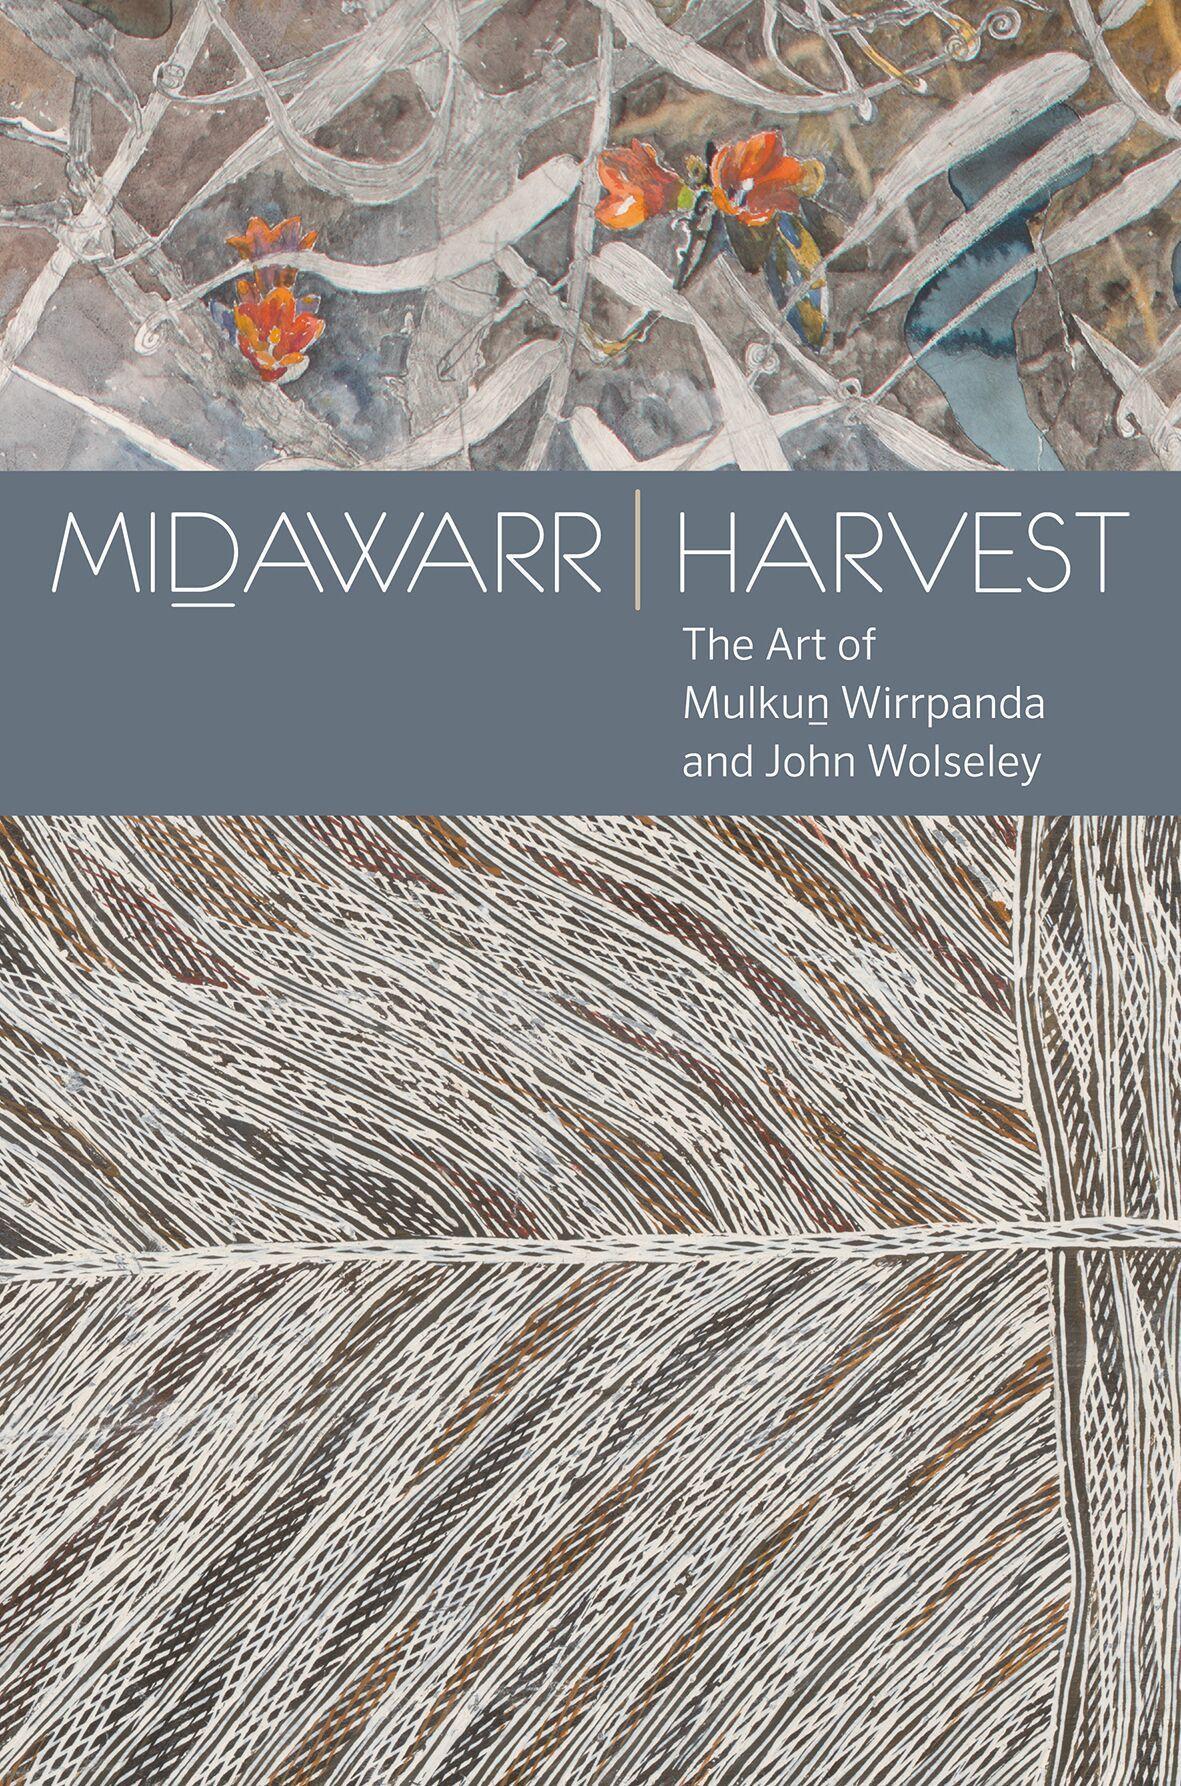 Midawarr Harvest: The Art of Mulkun Wirrpanda andJohnWolseley